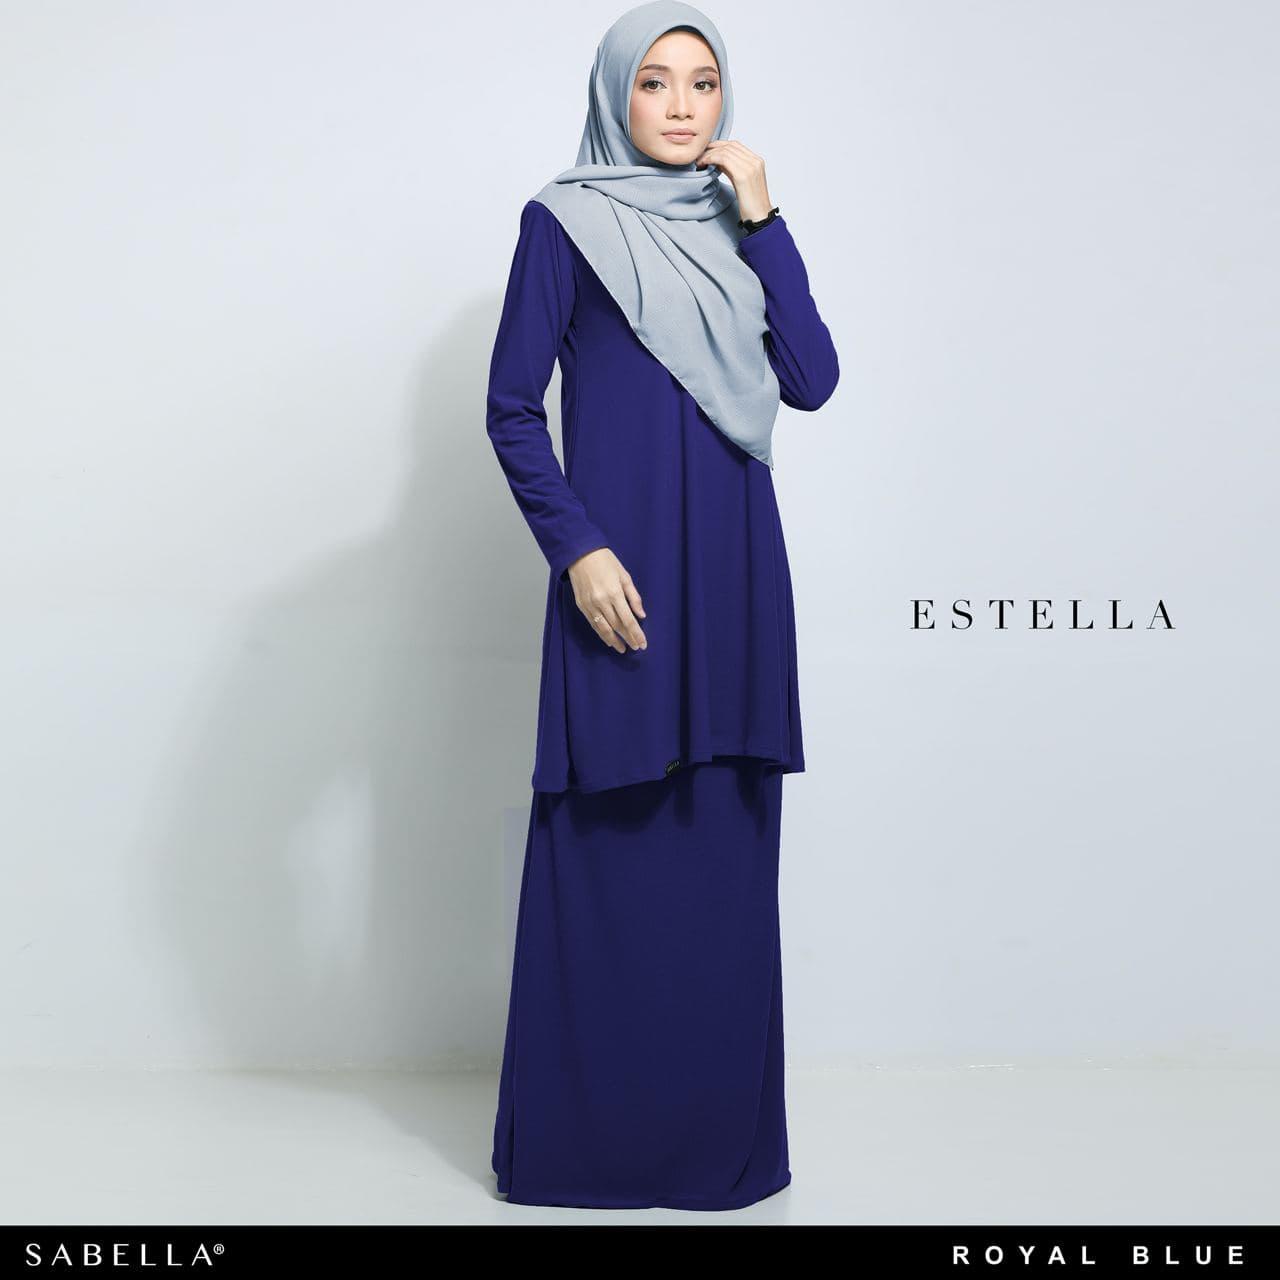 Estella 2.0 Royal Blue